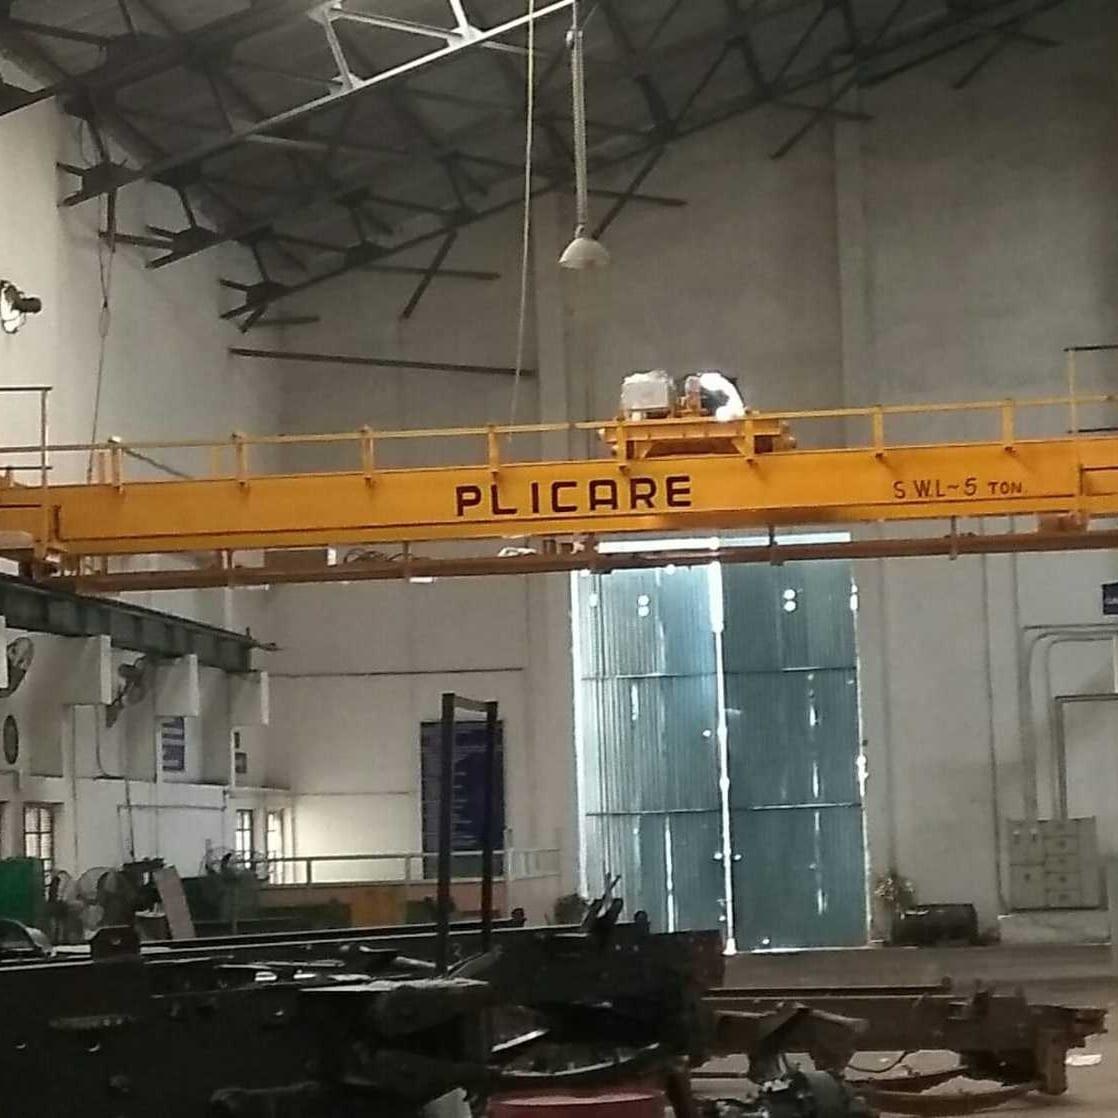 double girder eot crane, dg eot crane, double girder eot crane manufacturer, double girder crane, double girder overhead crane, double girder eot crane price,